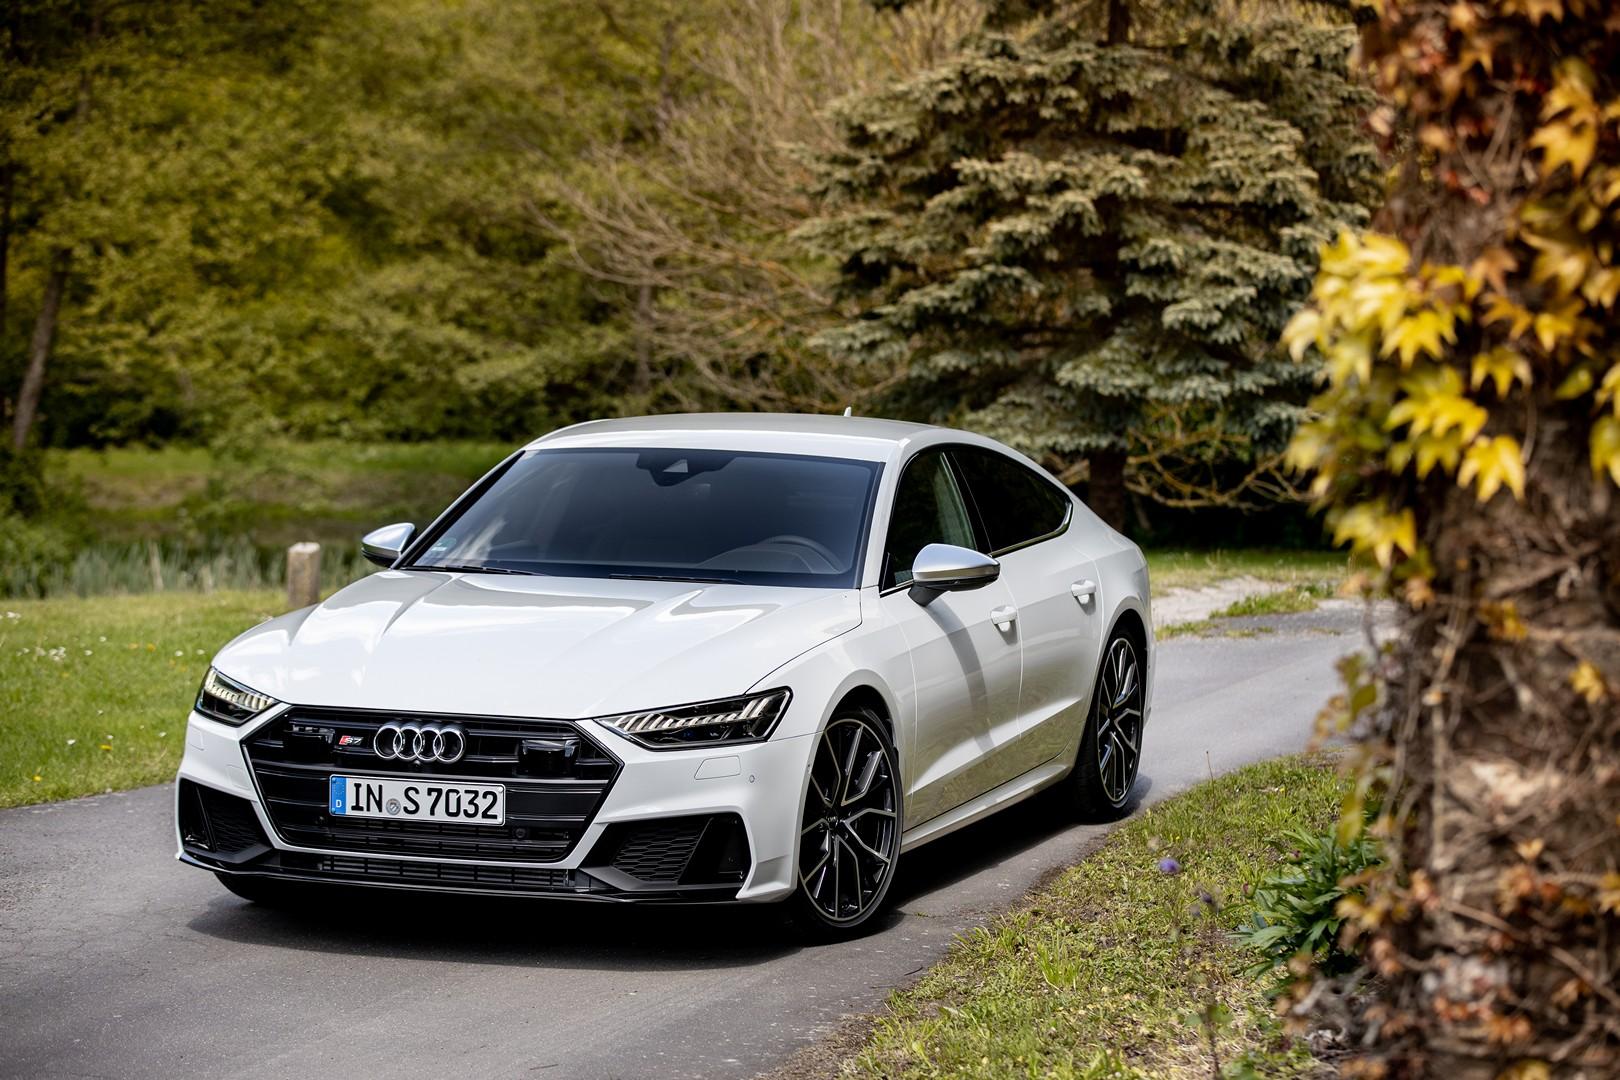 2020 Audi S7 Looks Stunning In Glacier White With Black Trim Autoevolution